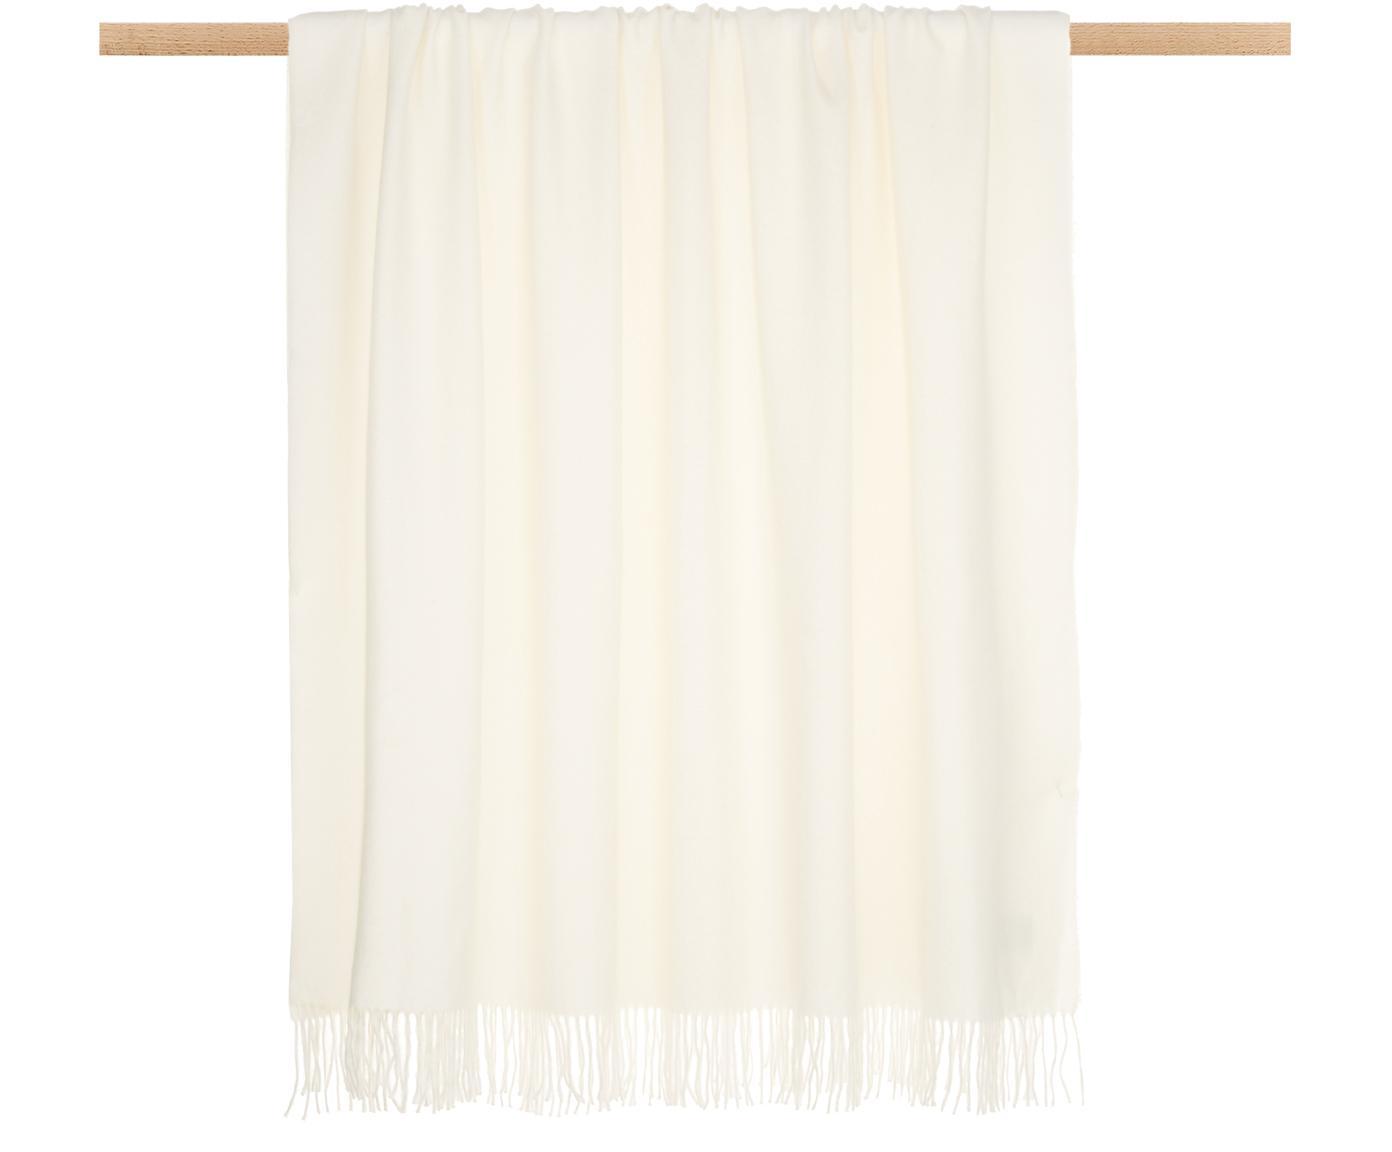 Manta de baby alpaca Luxury, Beige, blanco, An 130 x L 200 cm